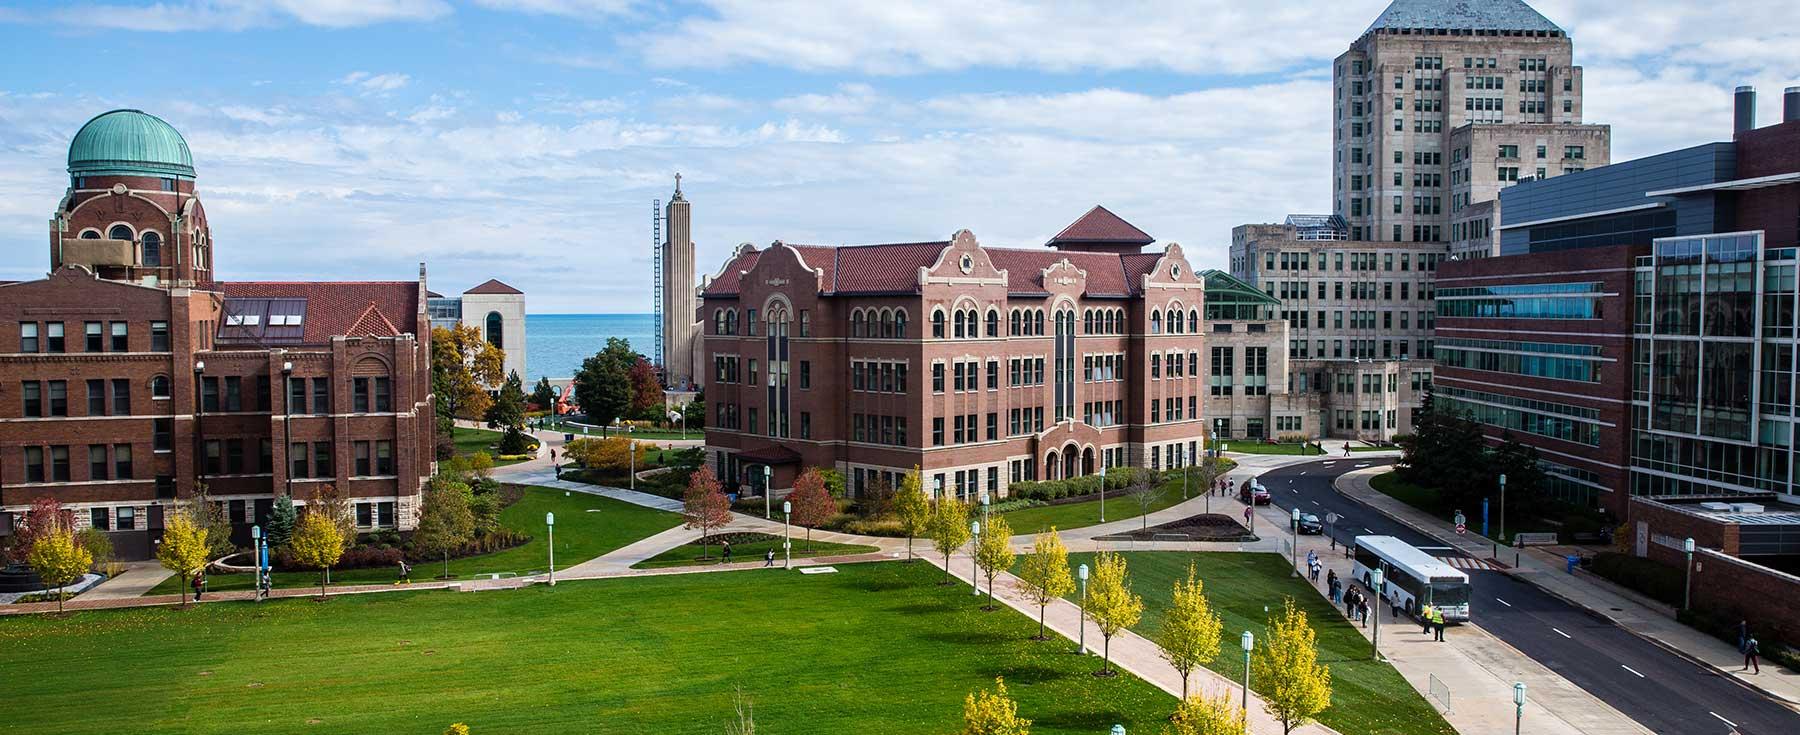 Loyola university of chicago 2